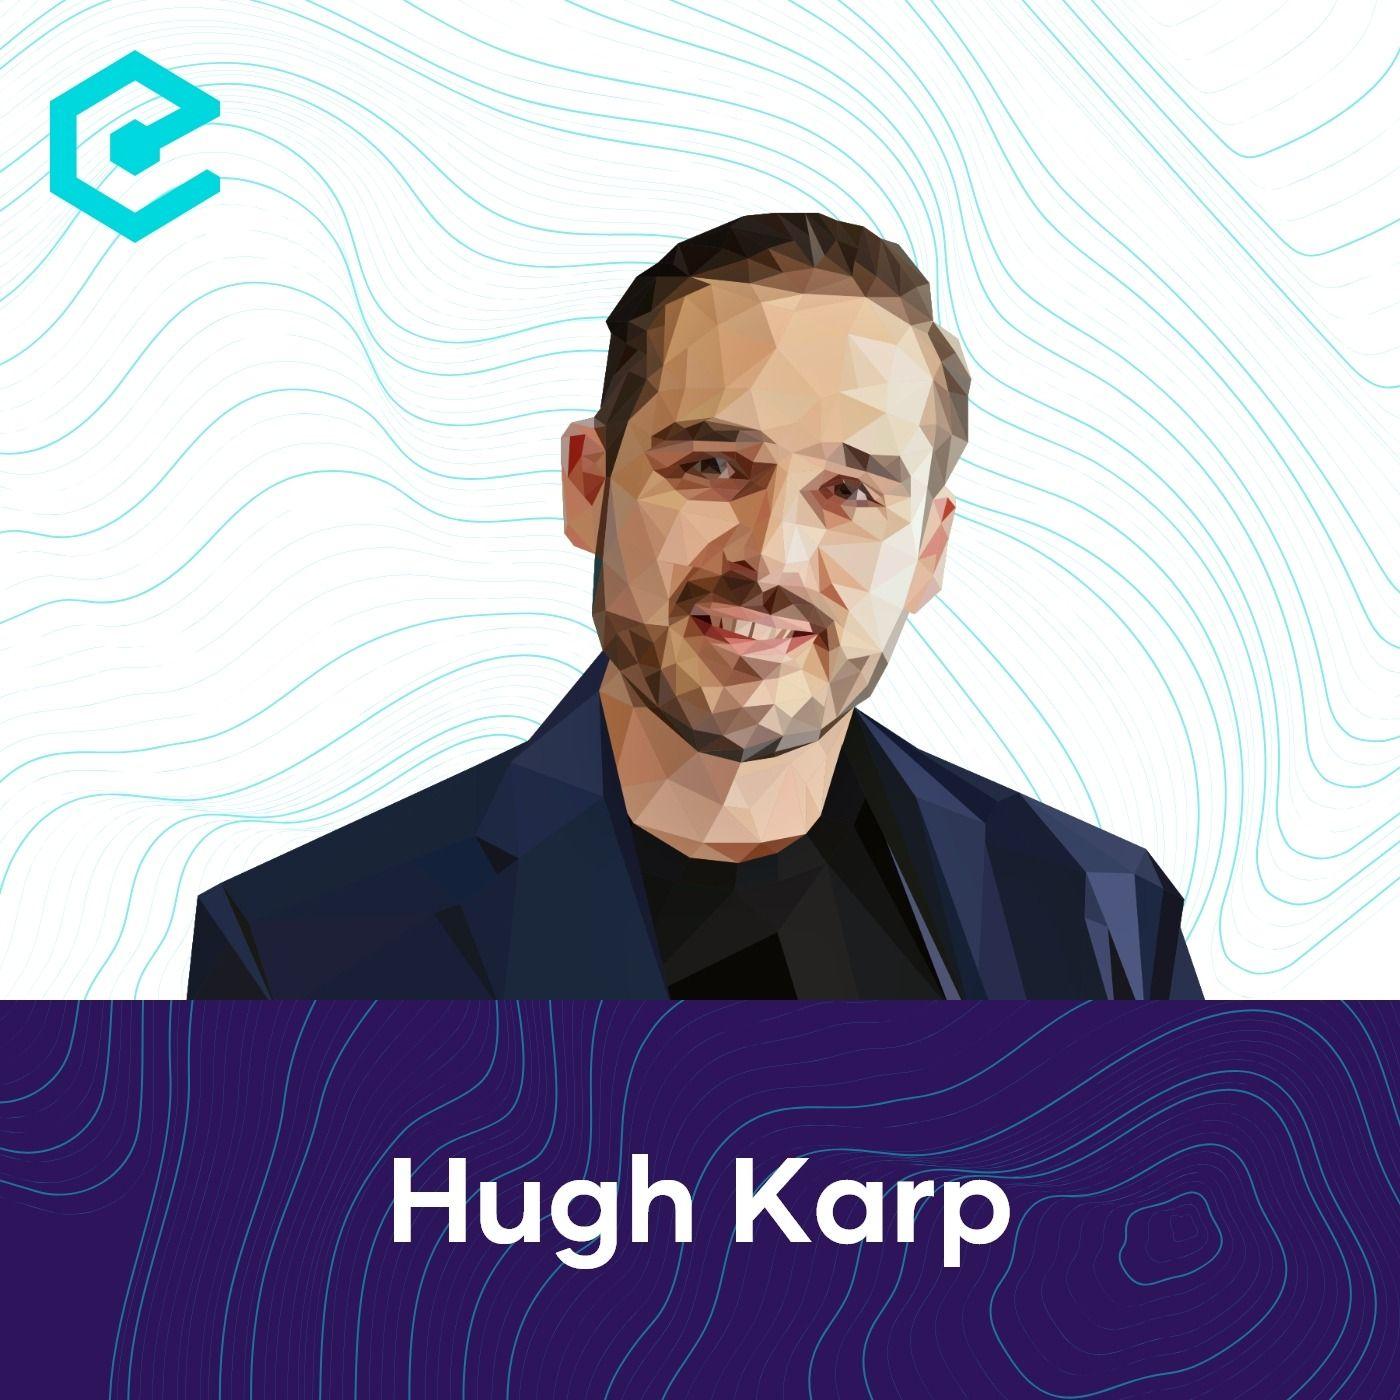 Hugh Karp: Nexus Mutual – The Decentralized Insurance for Ethereum